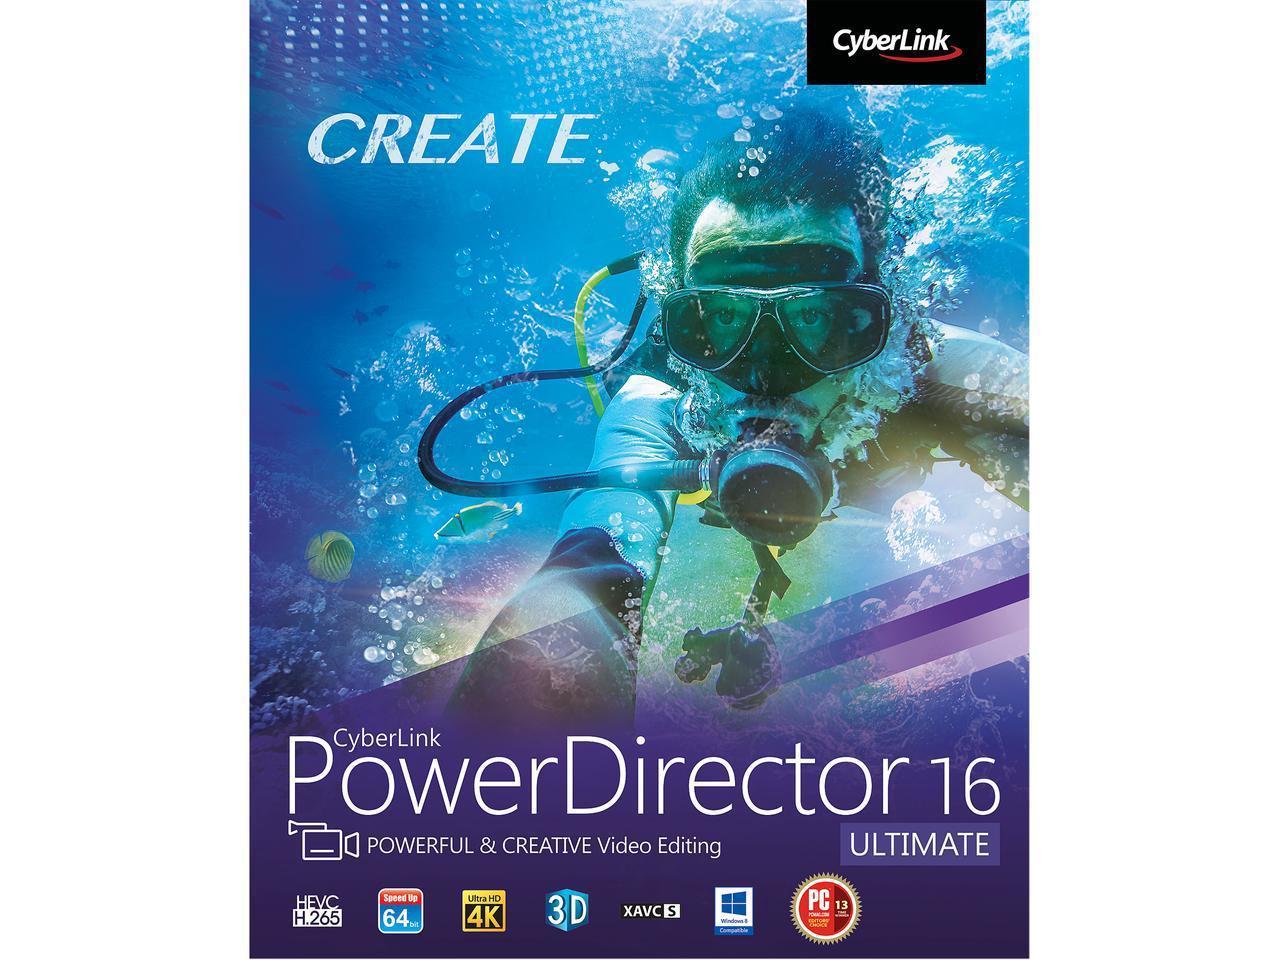 CyberLink PowerDirector 16 Ultimate Newegg.com with promo code EMCXEES43 $44.99